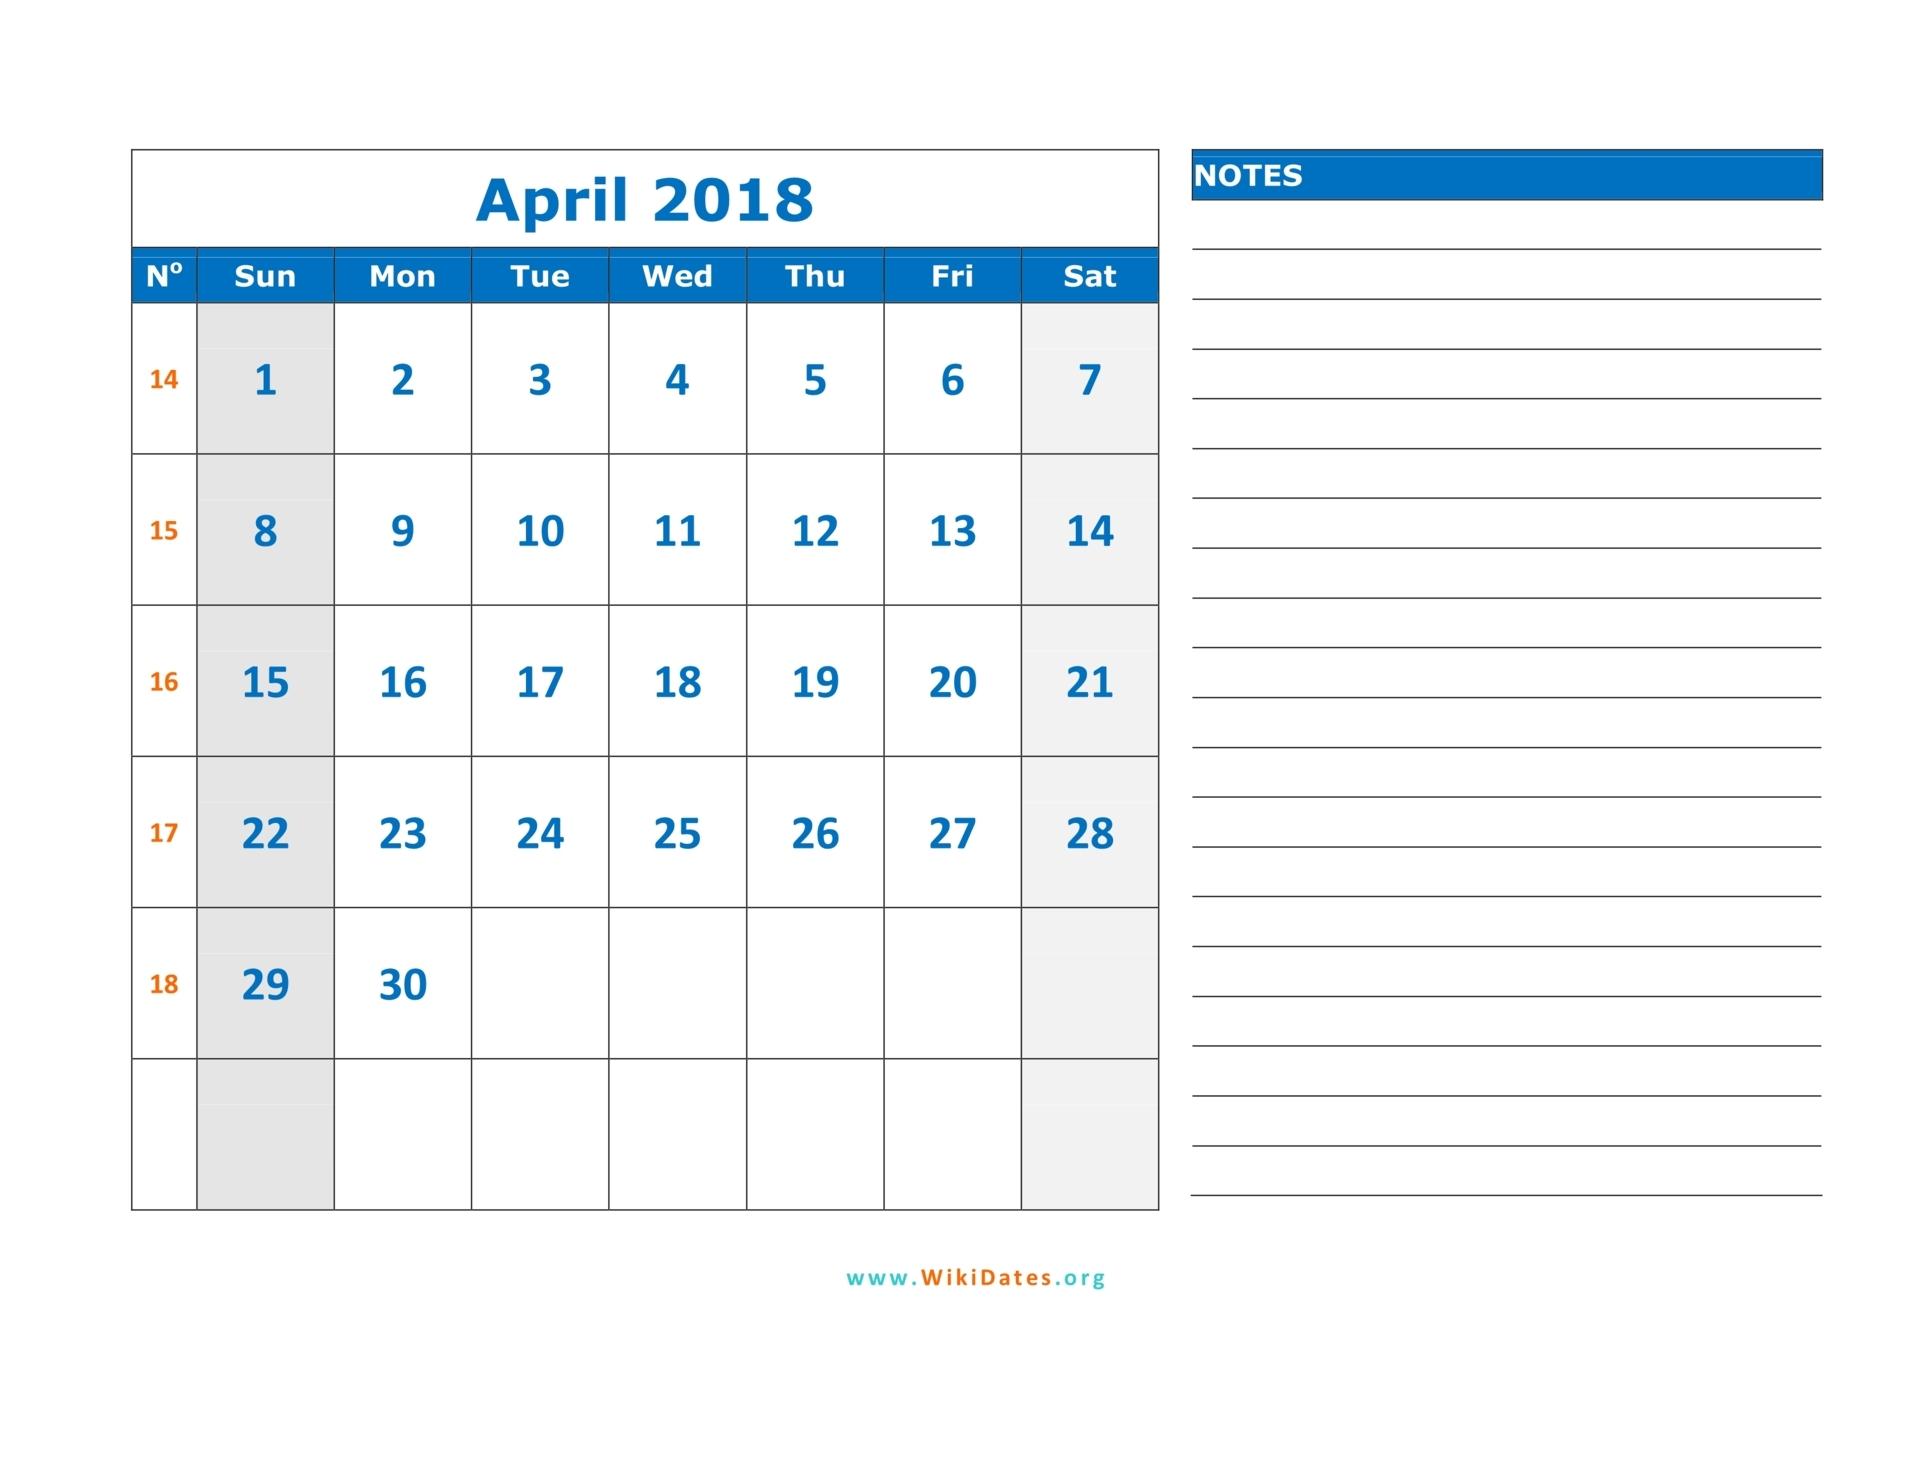 April 2018 Calendar | WikiDates.org